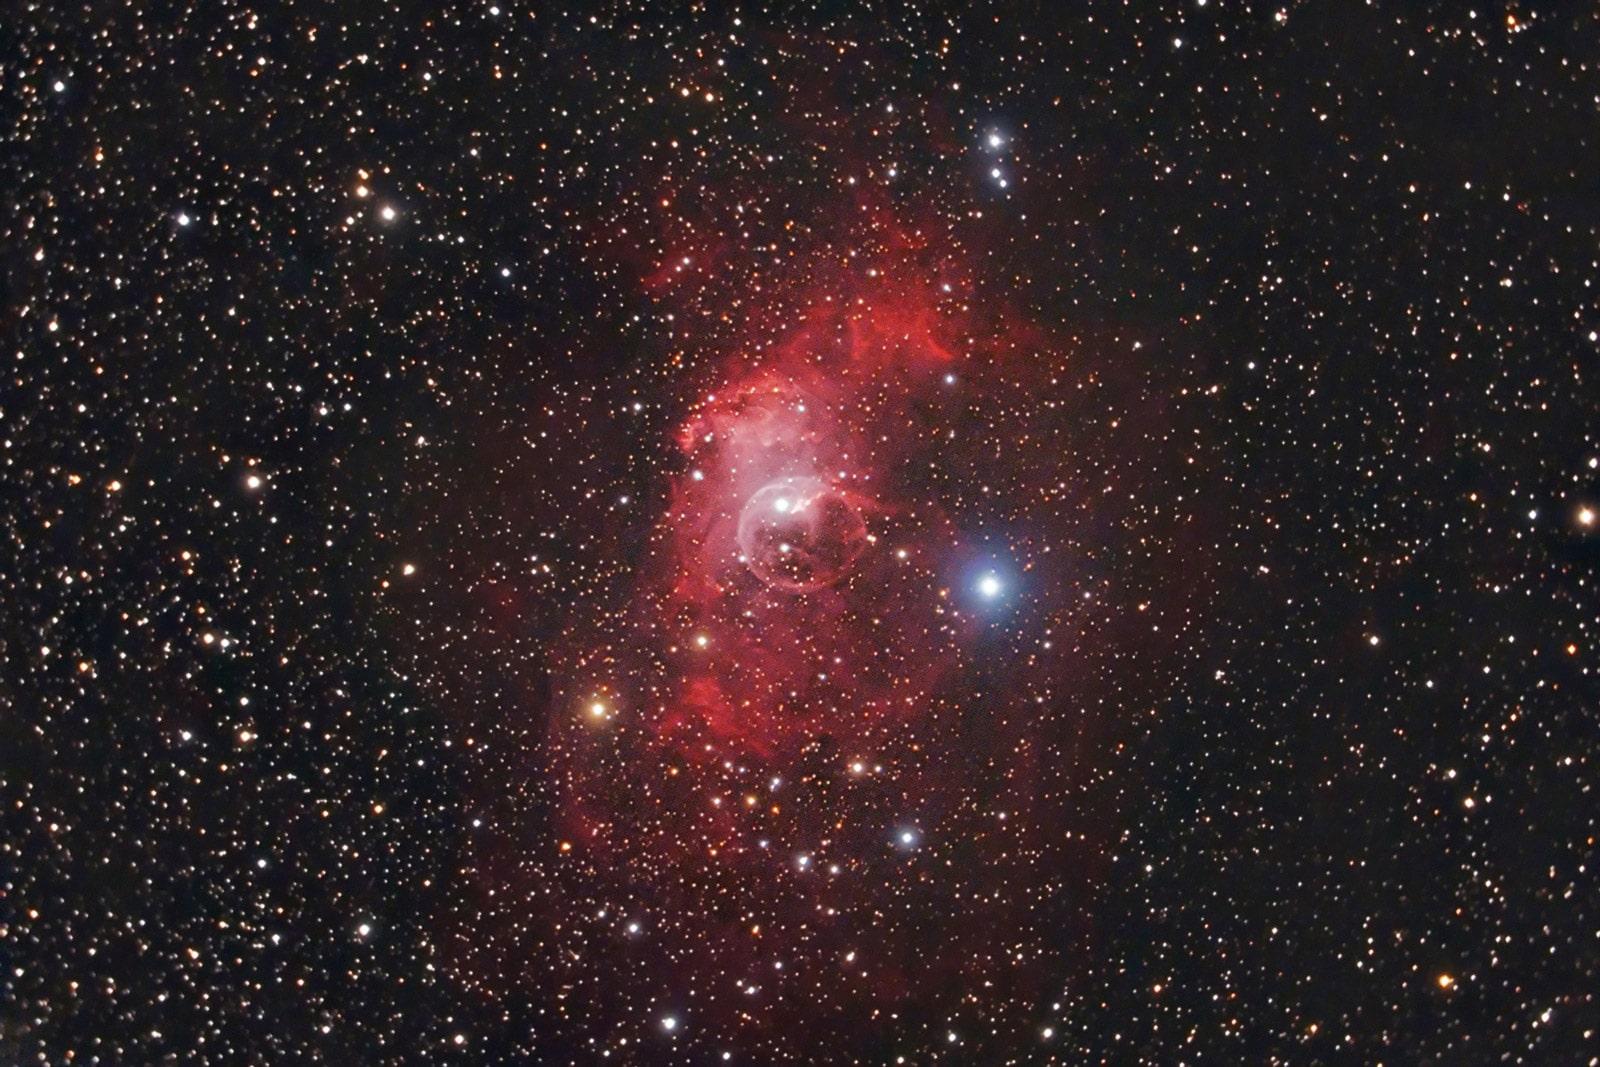 NGC 7635 The Bubble Nebula. August 2010.